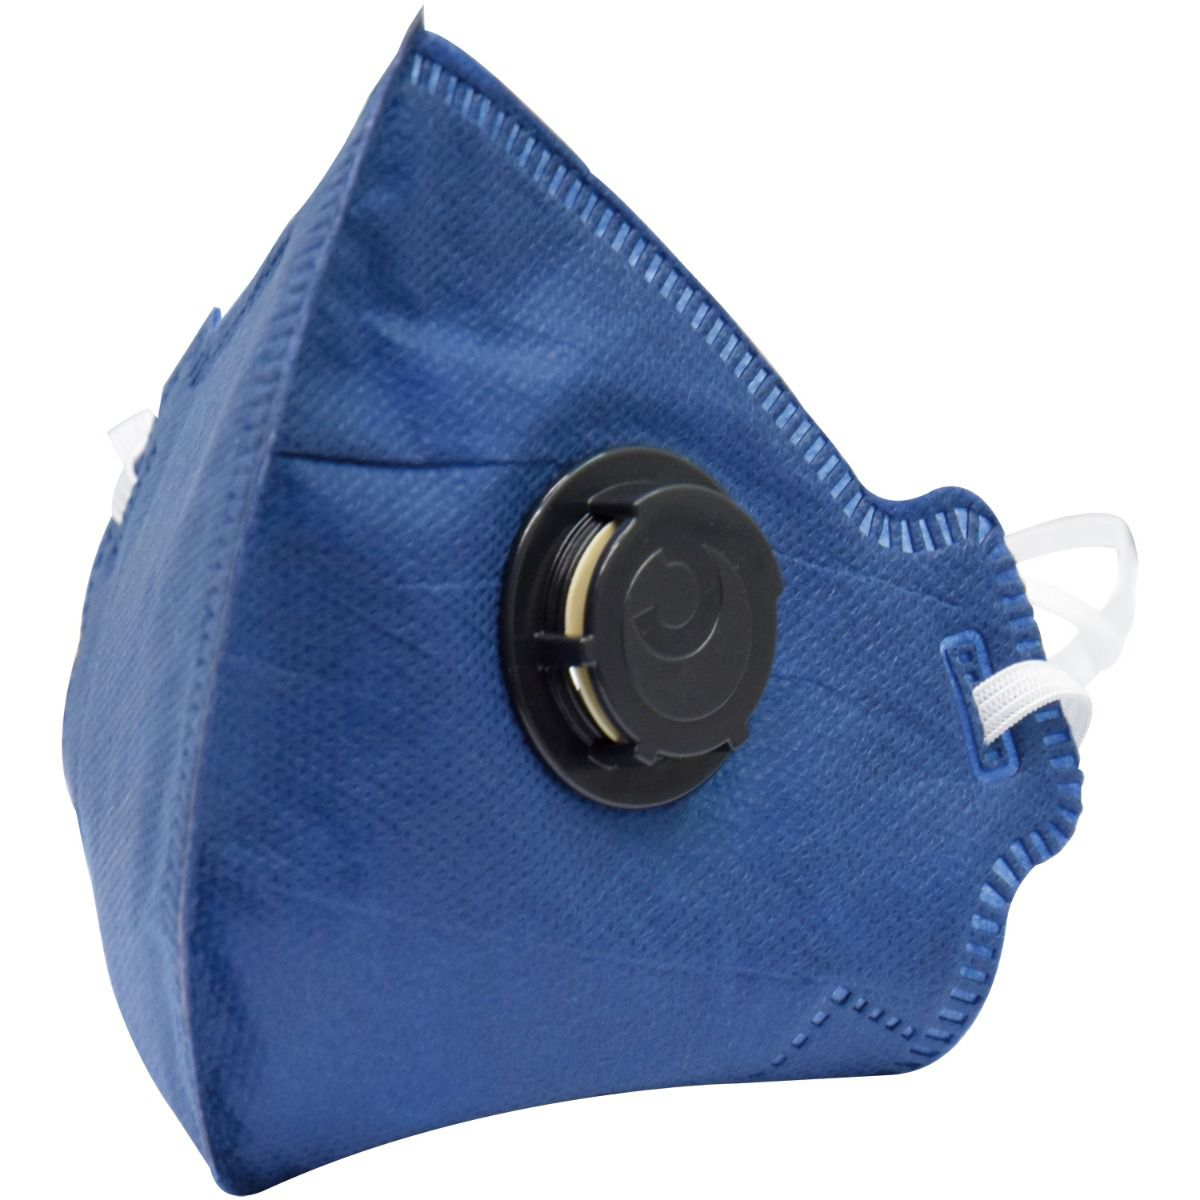 Respirador Descartável Camper Pff1 Com Válvula - 20 Unid.